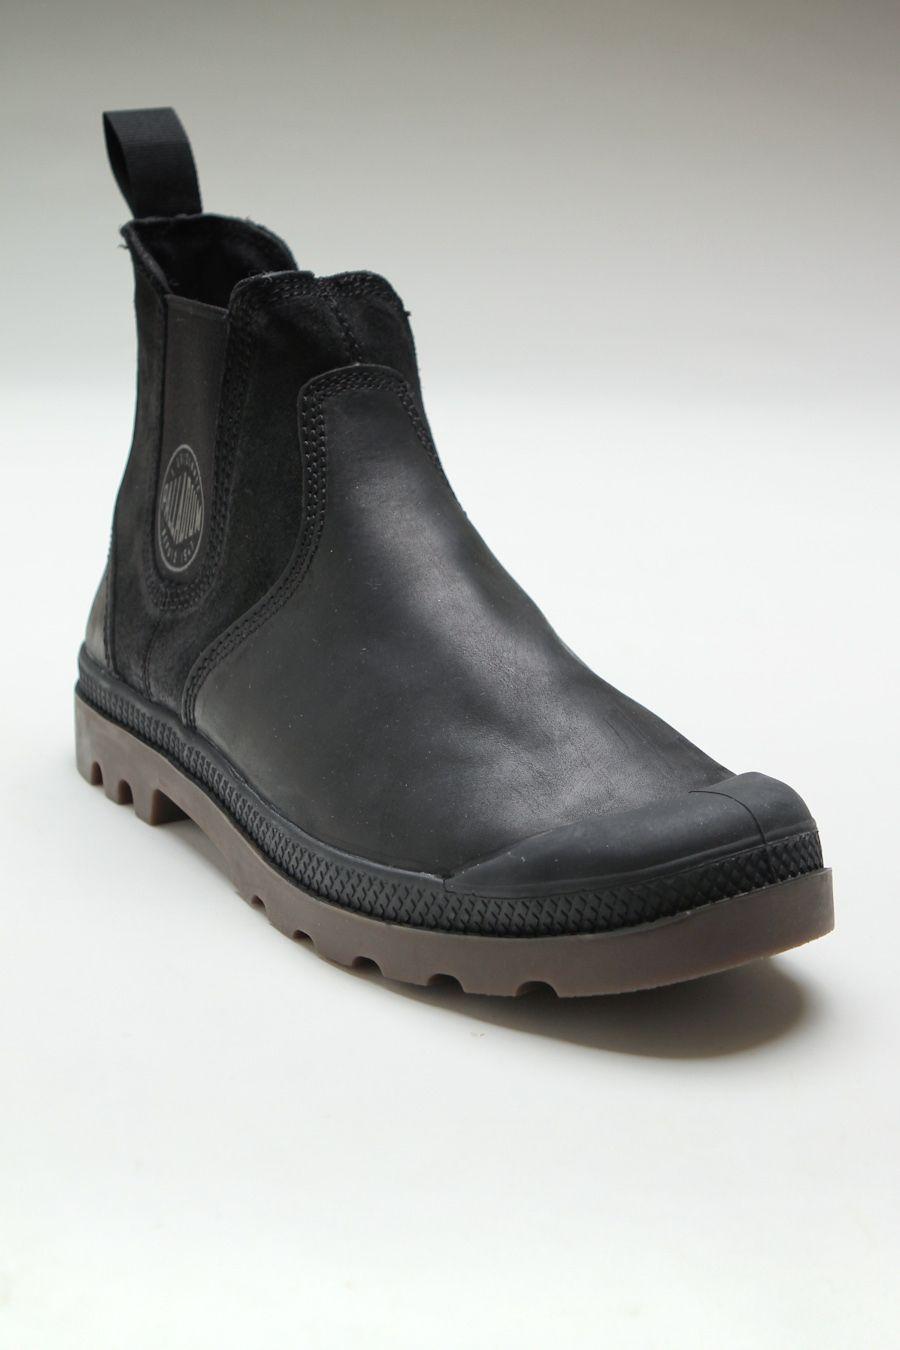 be2d3a9eb4 Pampa Chelsea Boot Palladium Boots, Mens Gadgets, Jack Threads, Designer  Boots, Men's